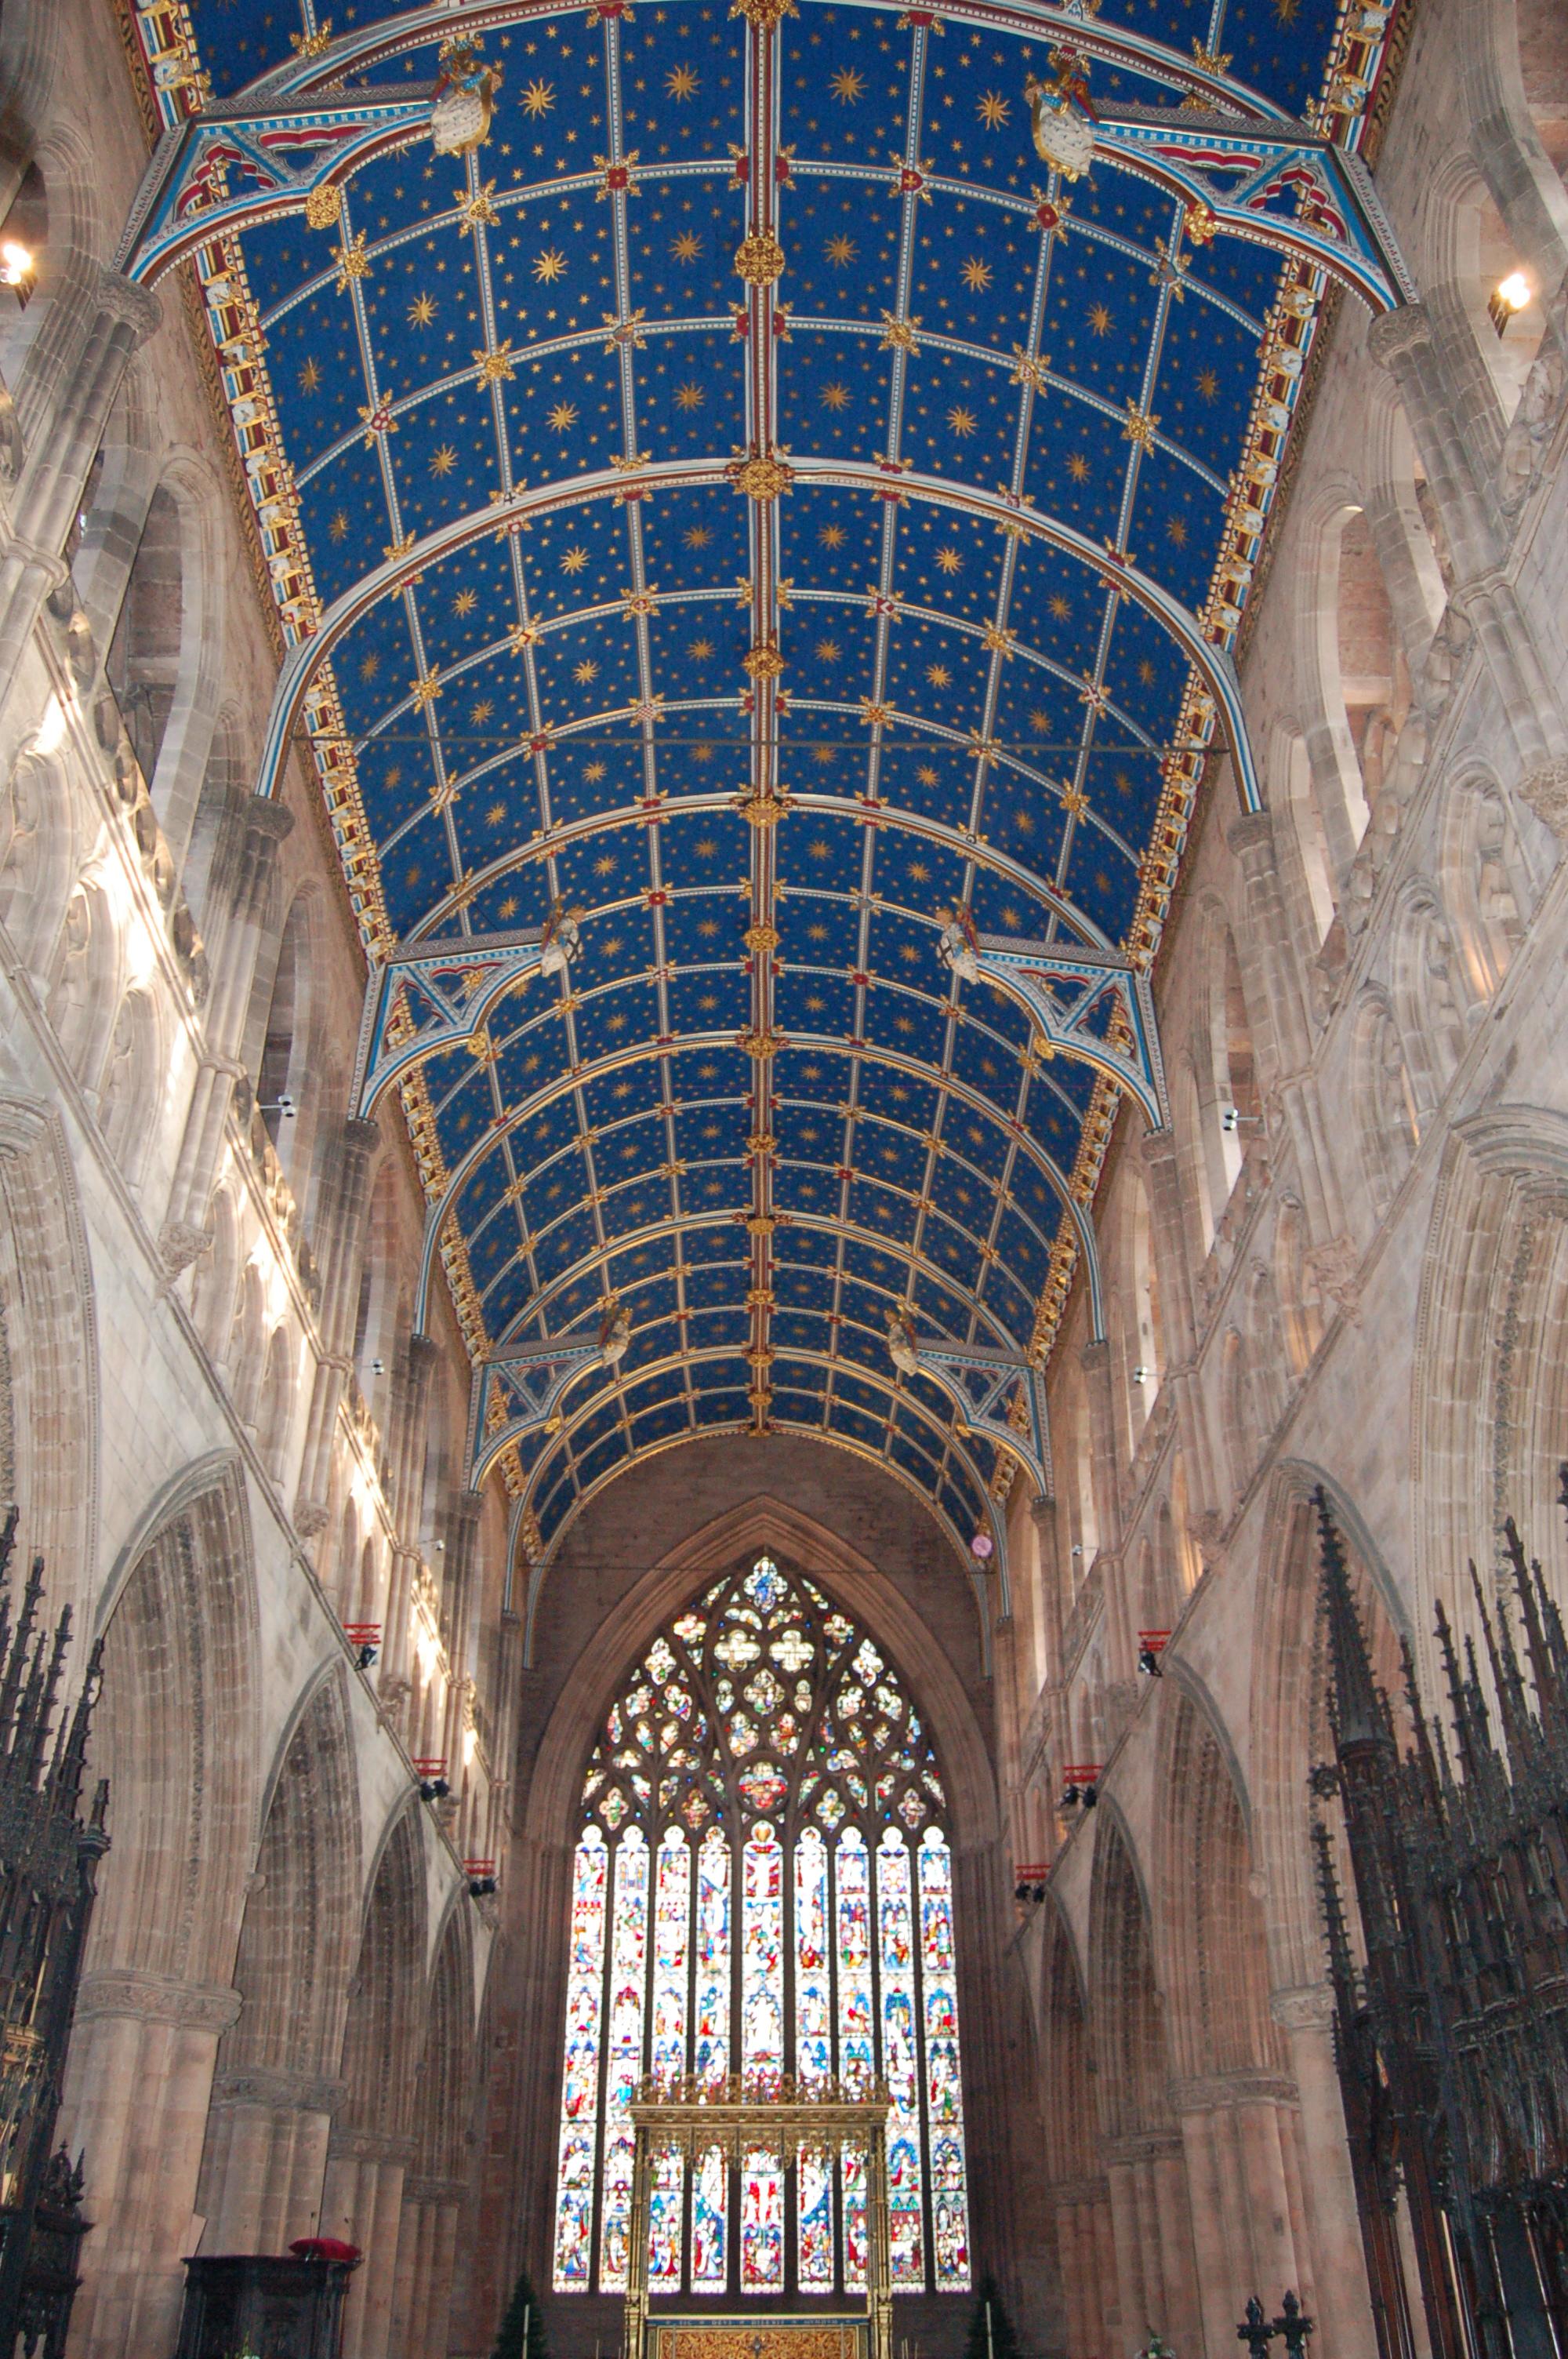 File:Carlisle Cathedral Barrel Ceiling